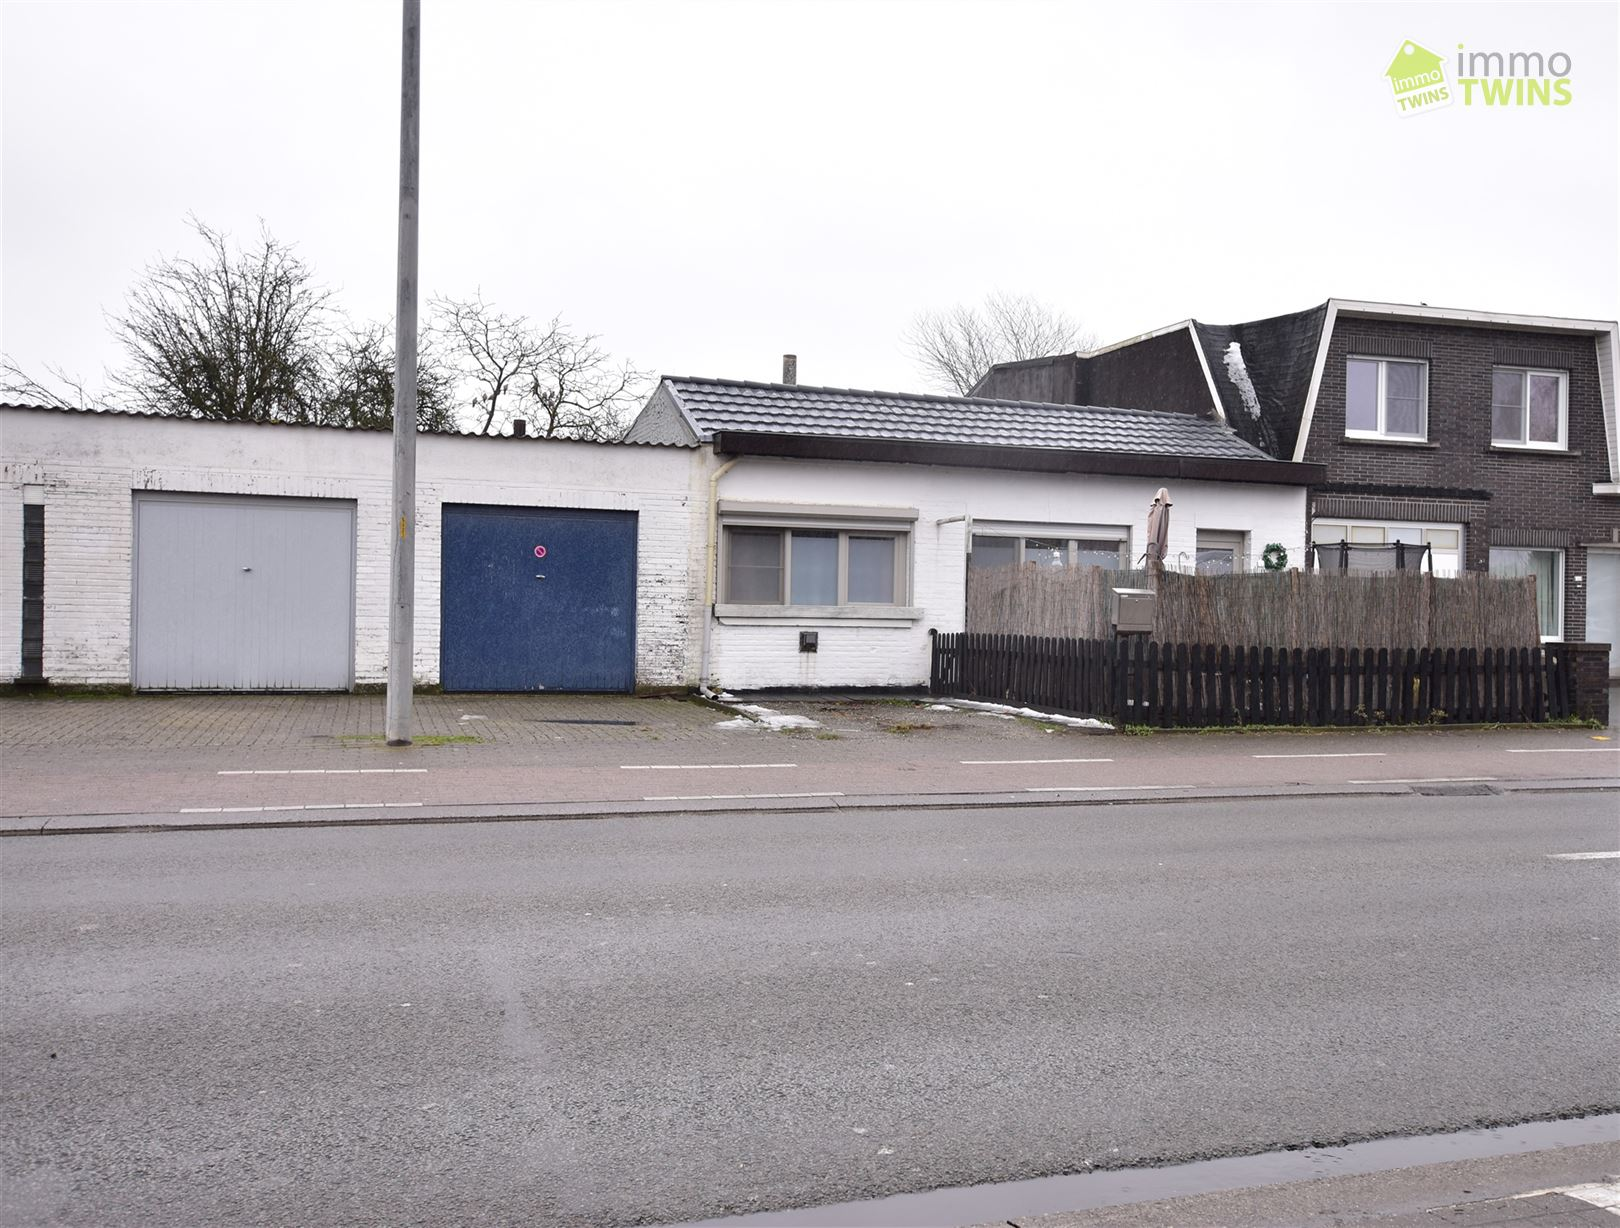 Foto 14 : Woning te 9200 Sint-Gillis-bij-Dendermonde (België) - Prijs € 585